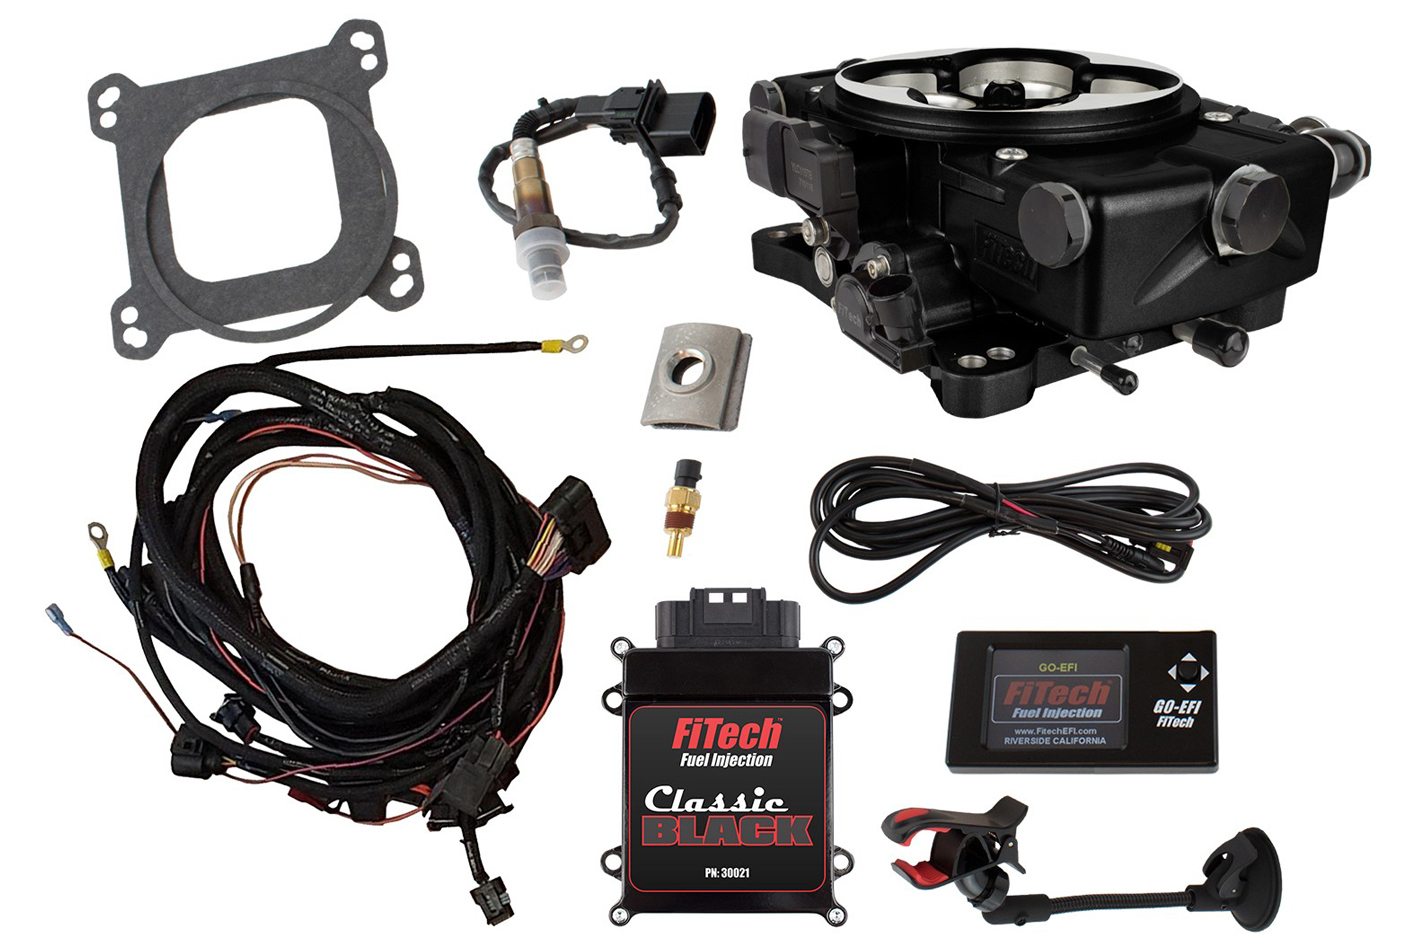 Fitech Fuel Injection Go EFI Classic 550 HP EFI w/External ECU Black